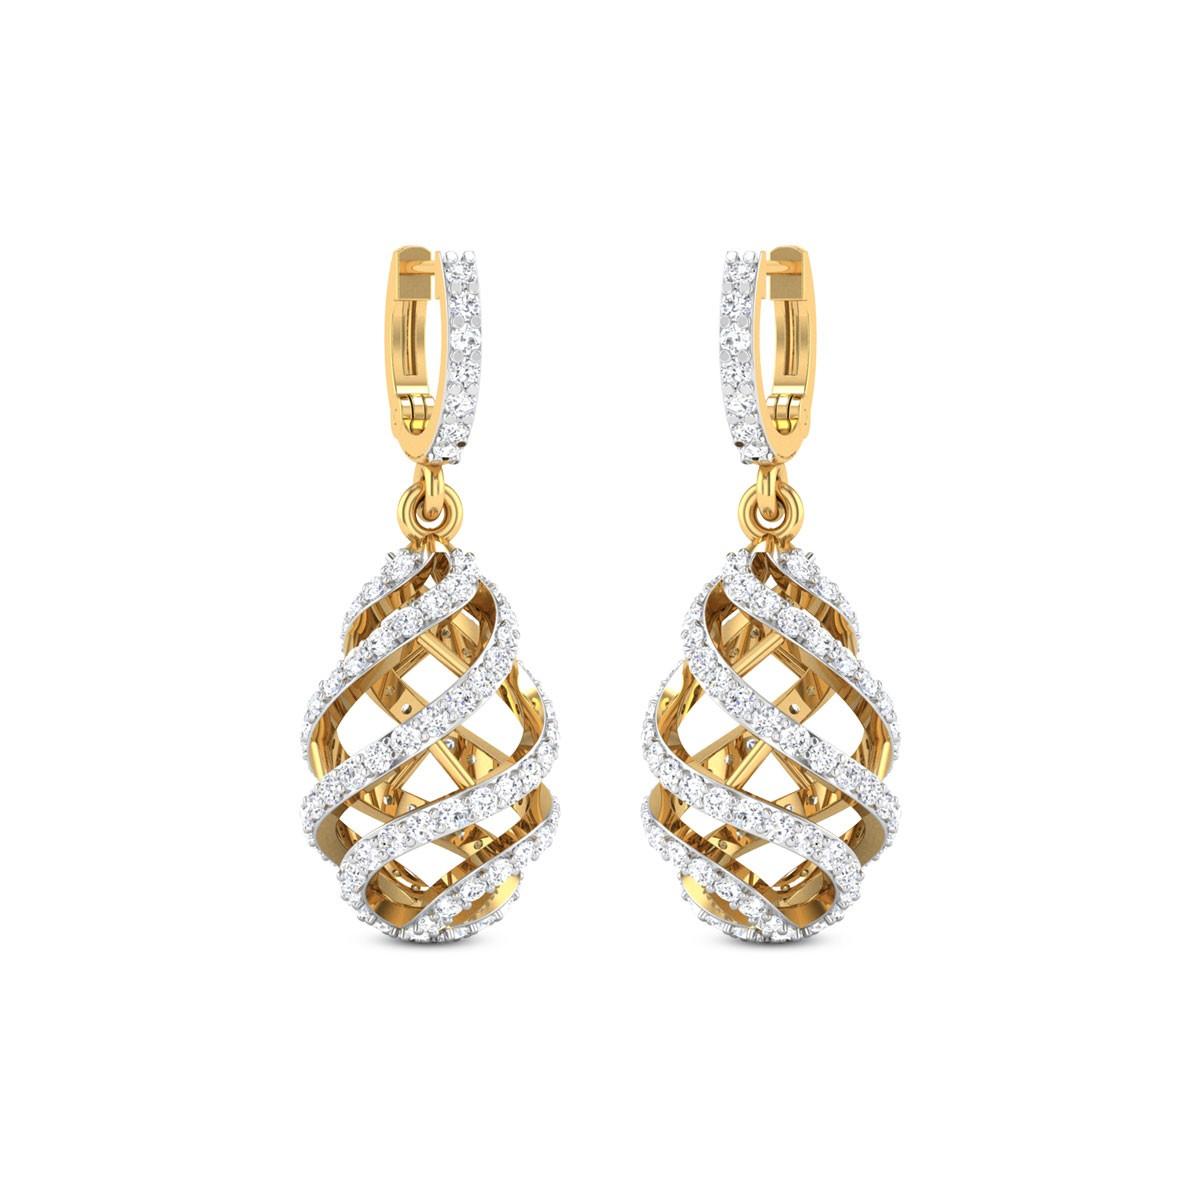 Hanging Cage Diamond Earrings